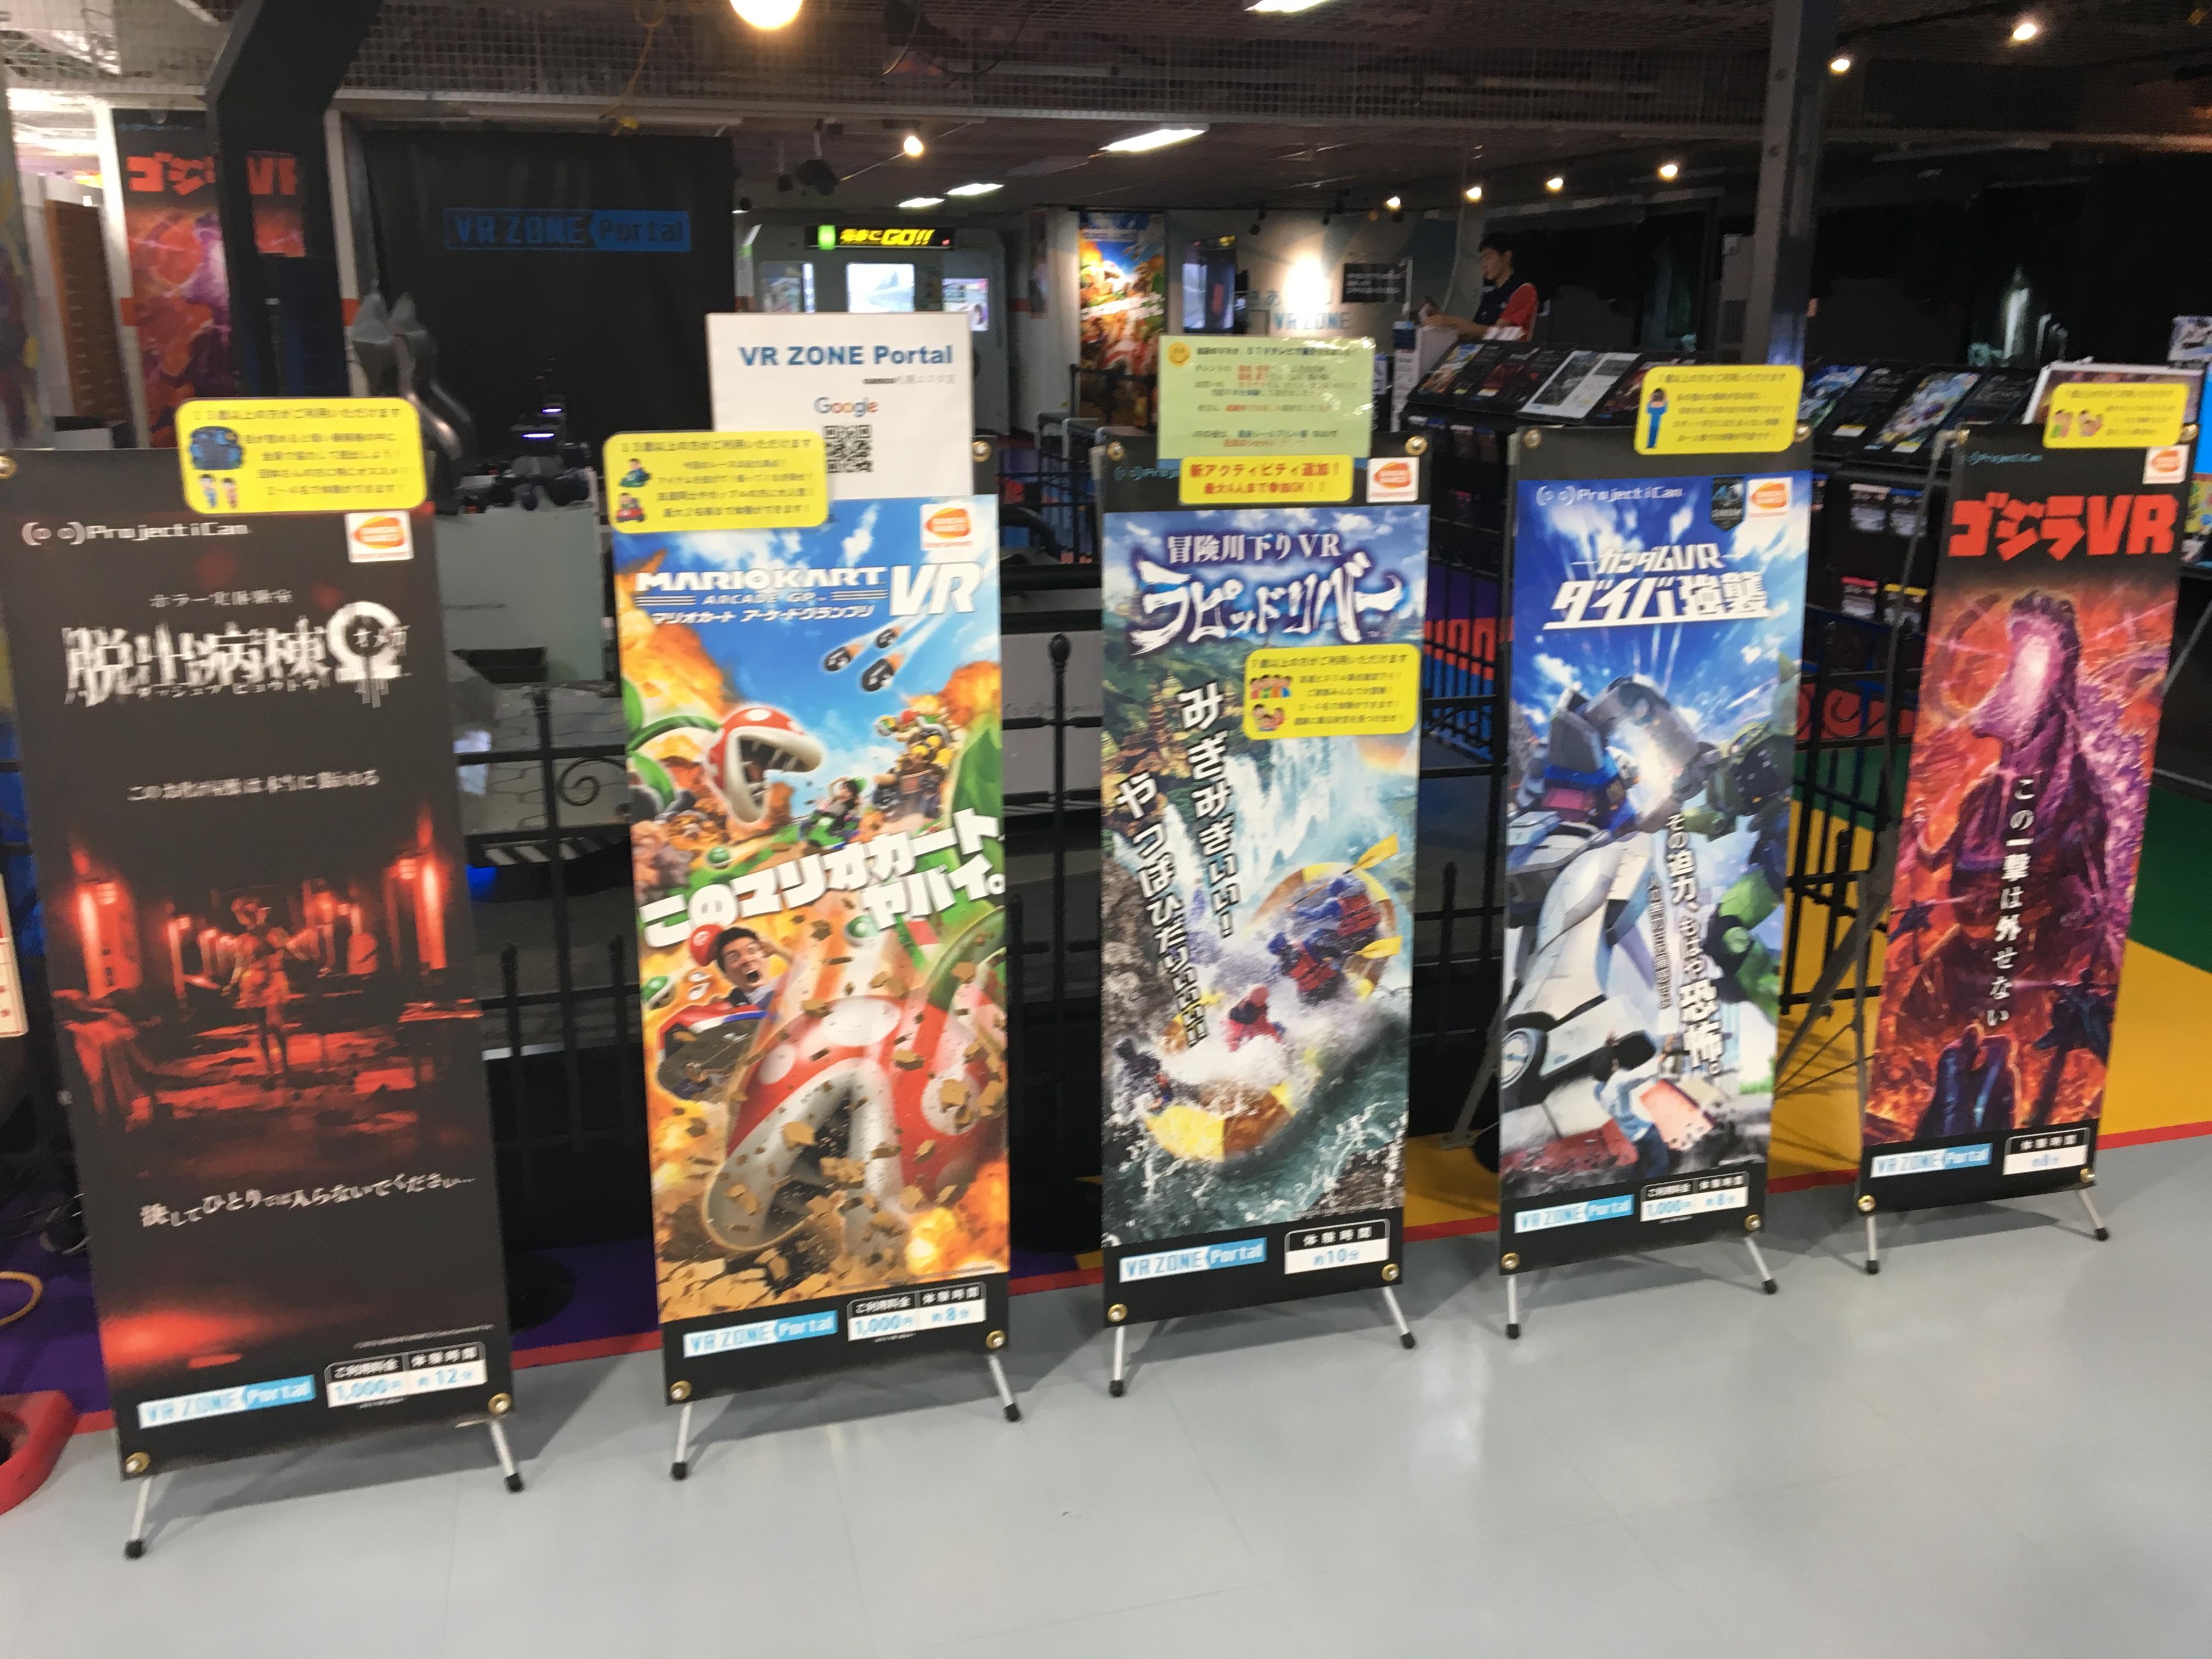 『VR ZONE Portal』namco札幌エスタ店のラインナップ